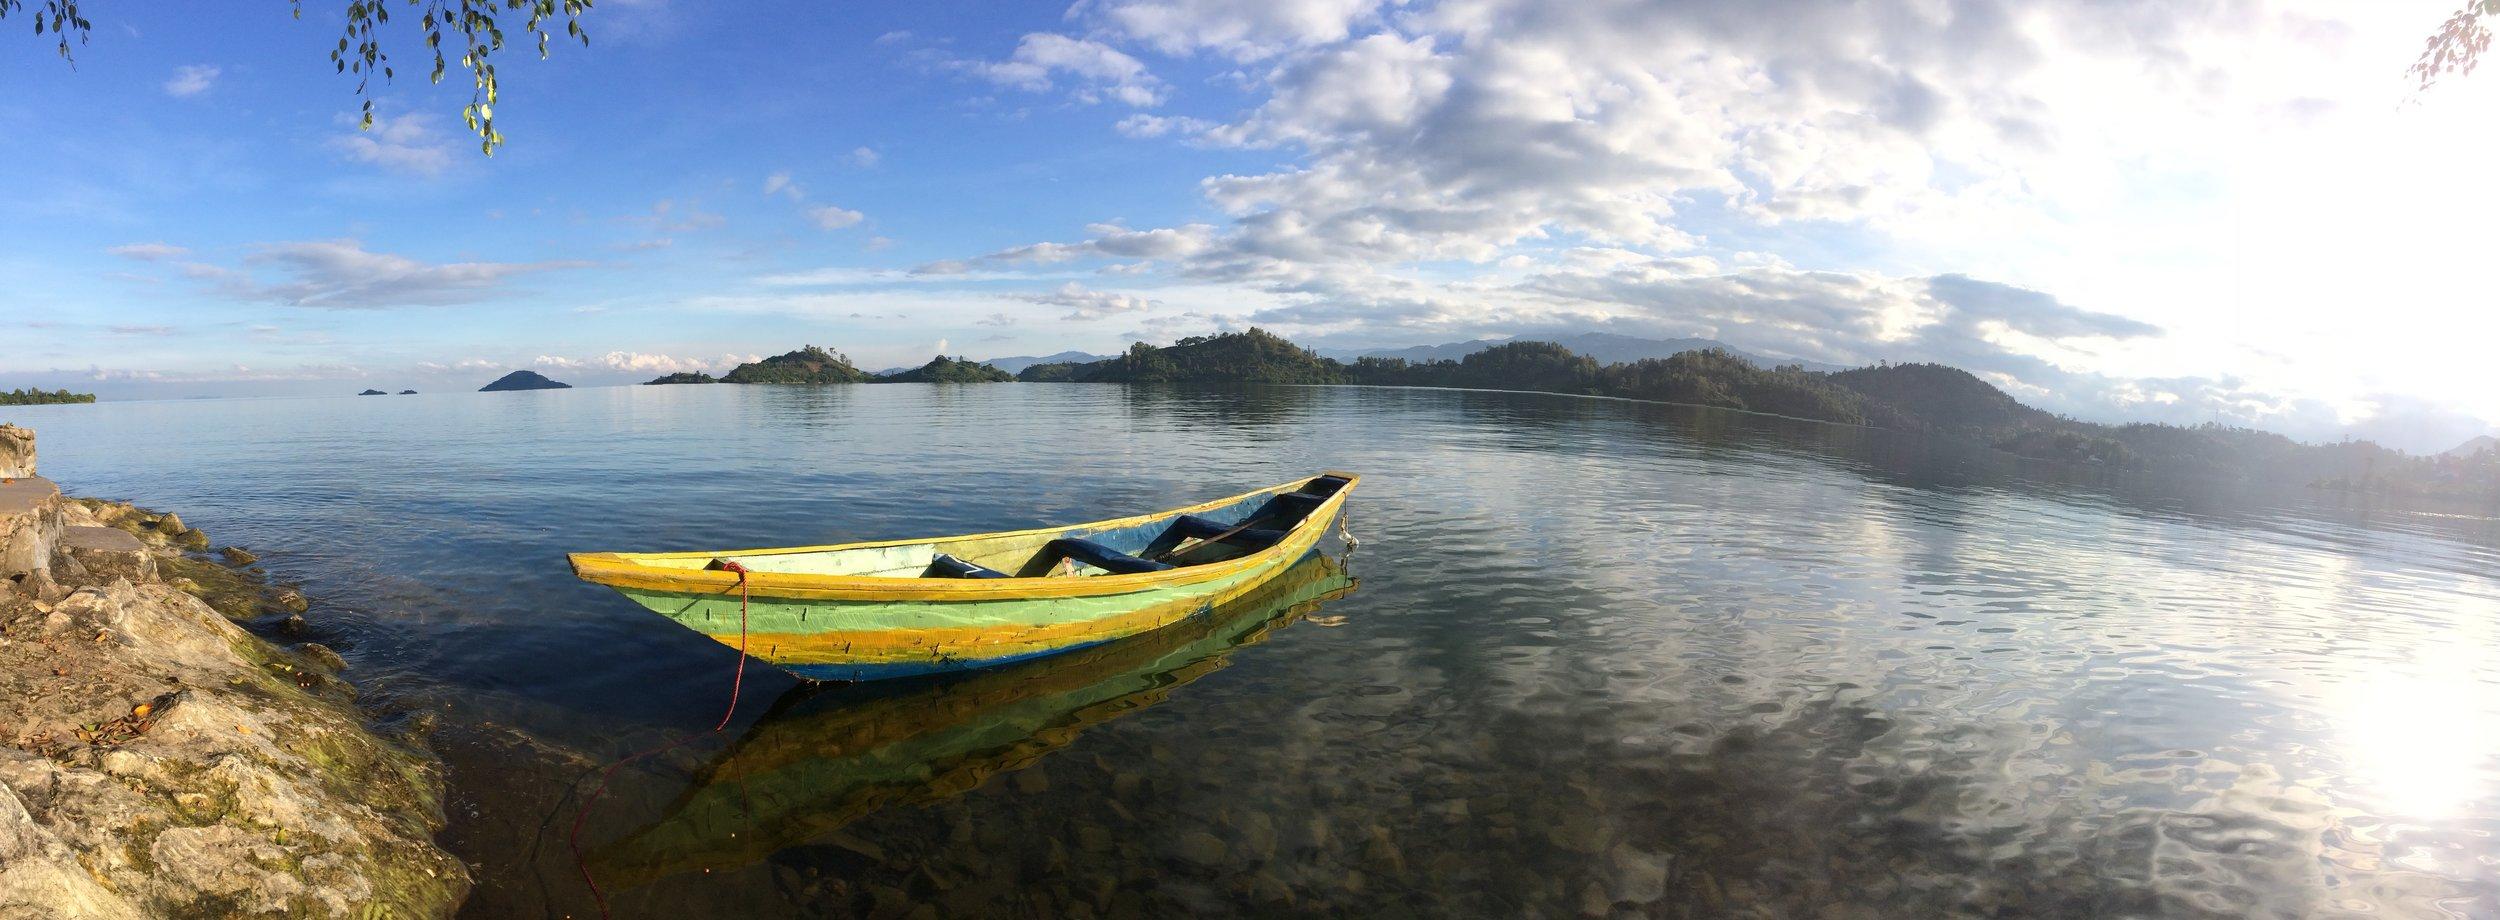 Lake Kivu in Rwanda's Western Province